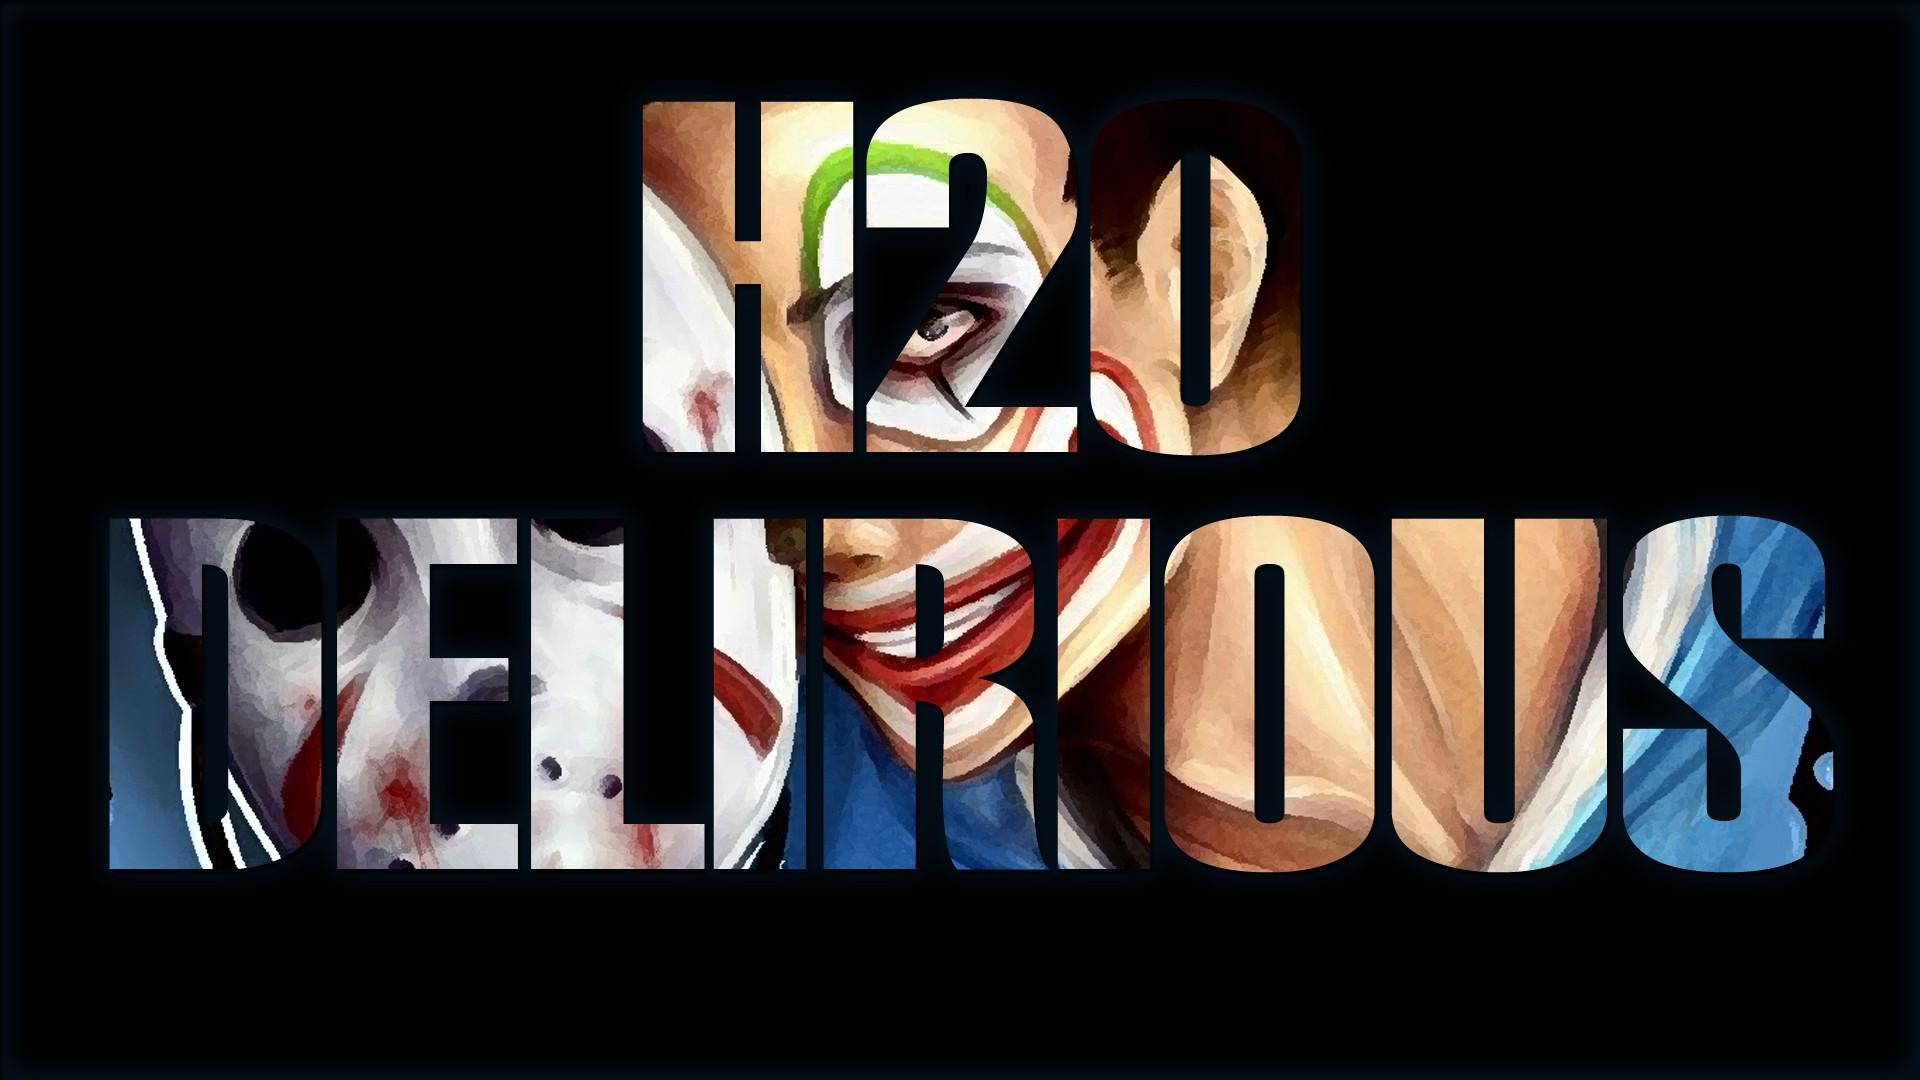 Fond D écran Texte Youtube Dessin Animé Marque Clowns